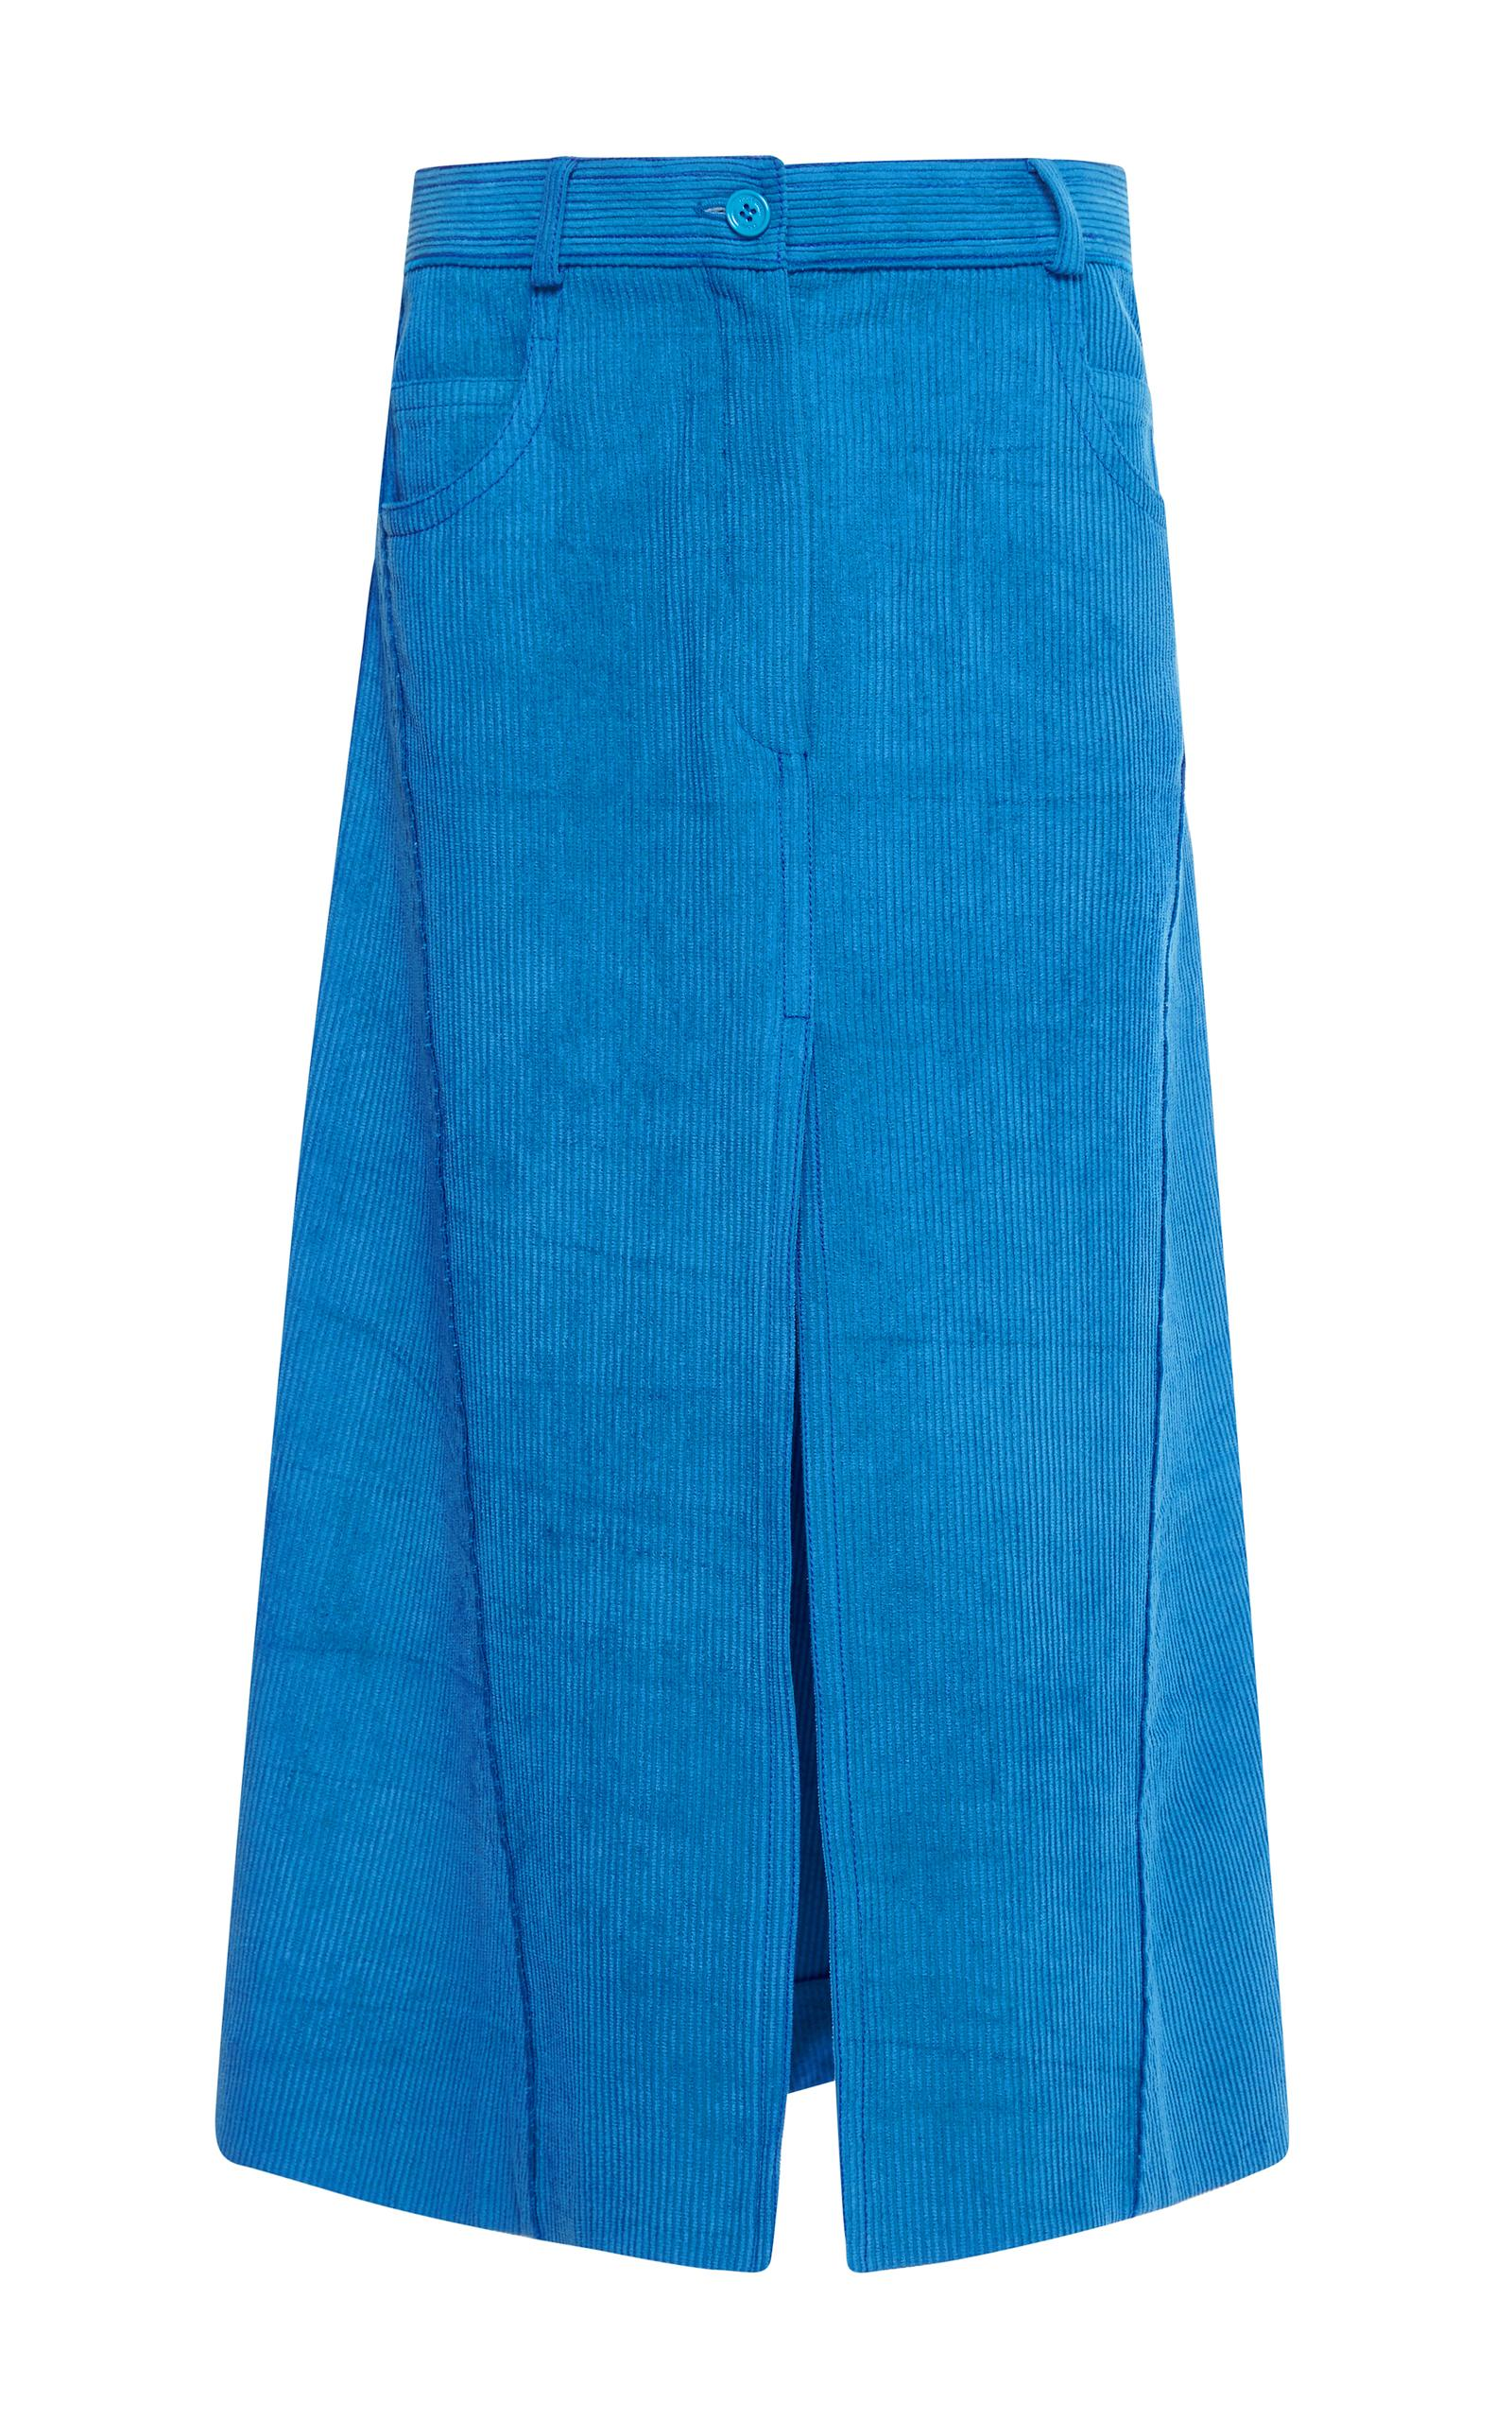 Cut off blue corduroy skirt